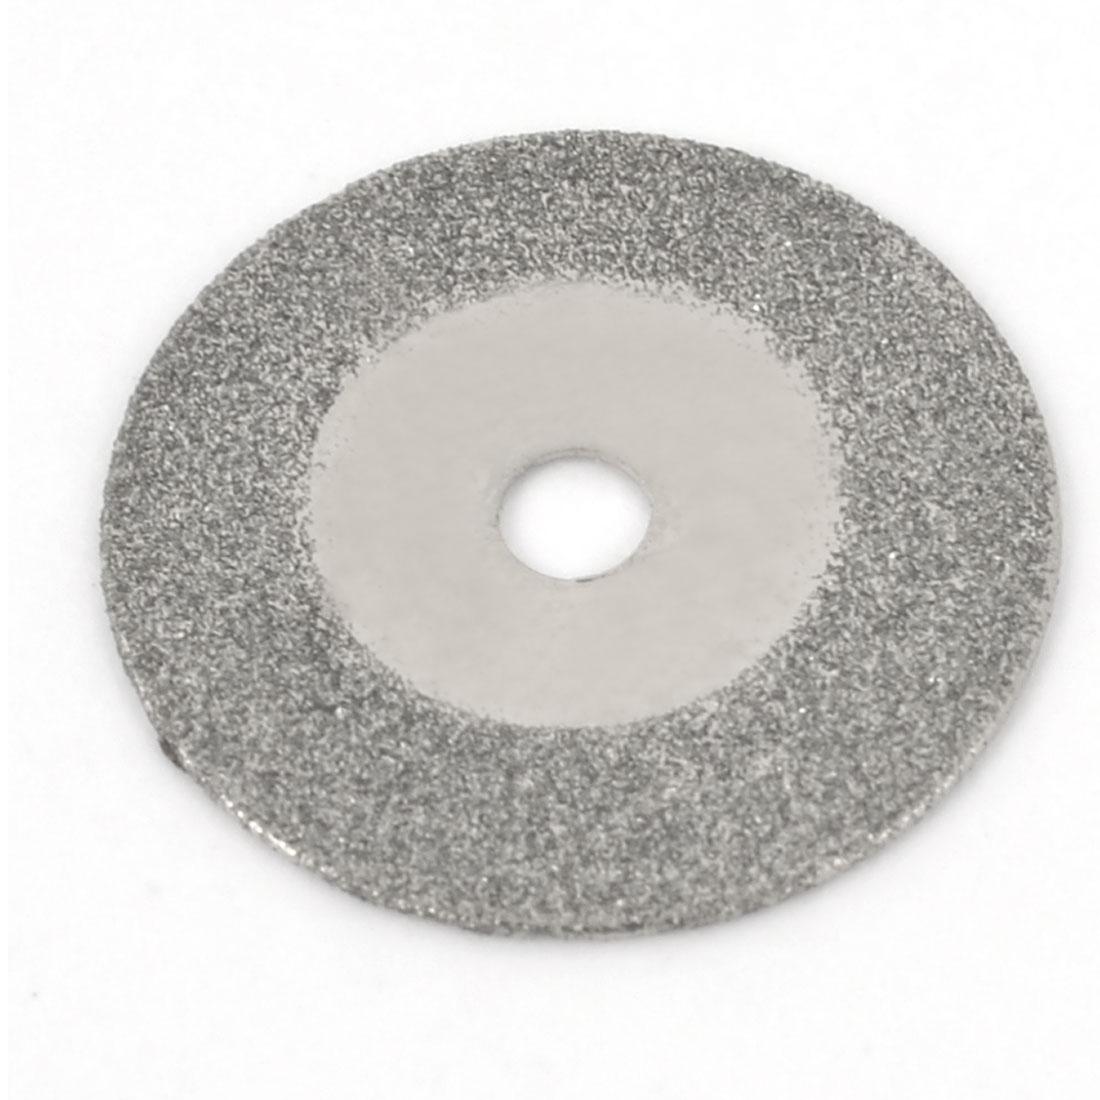 Silver Tone 20mm Dia Diamond Coated Glass Grinding Cutting Cut-off Wheel Disc